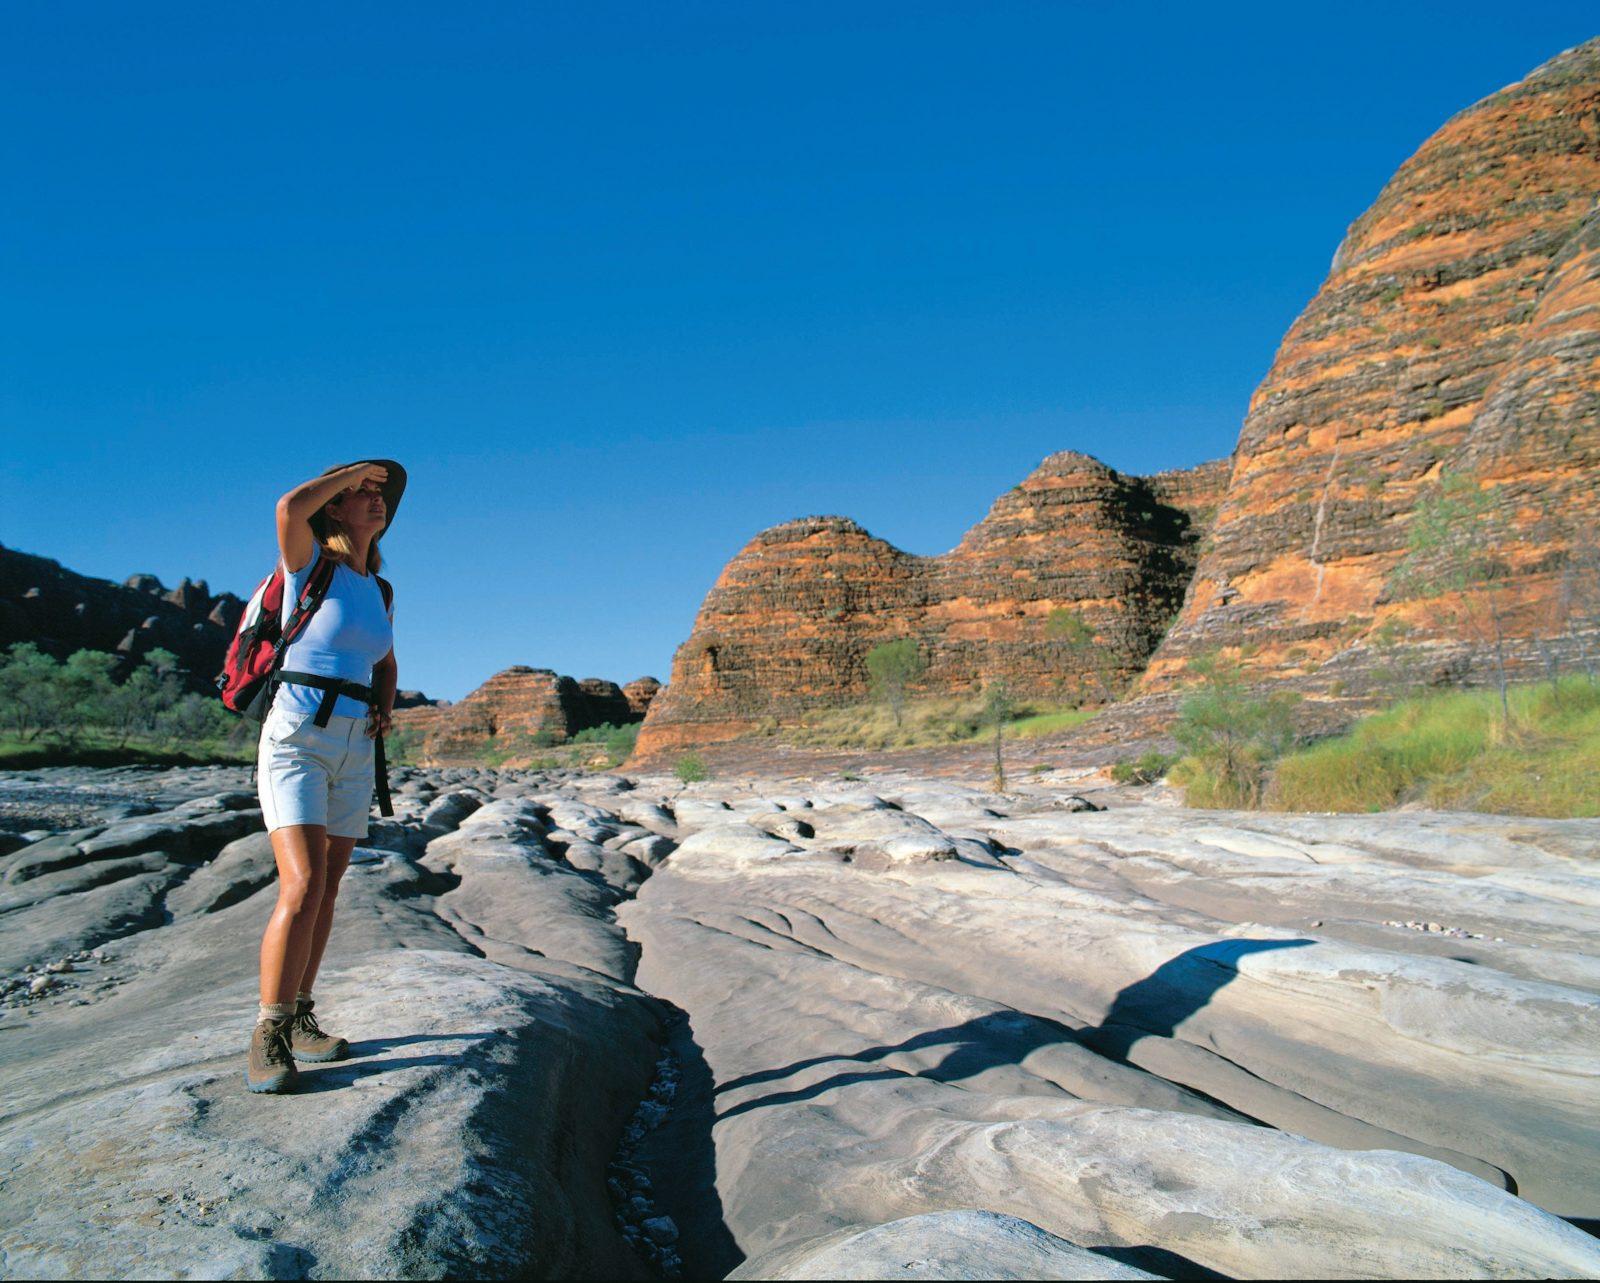 In WA Adventures, Broome, Western Australia